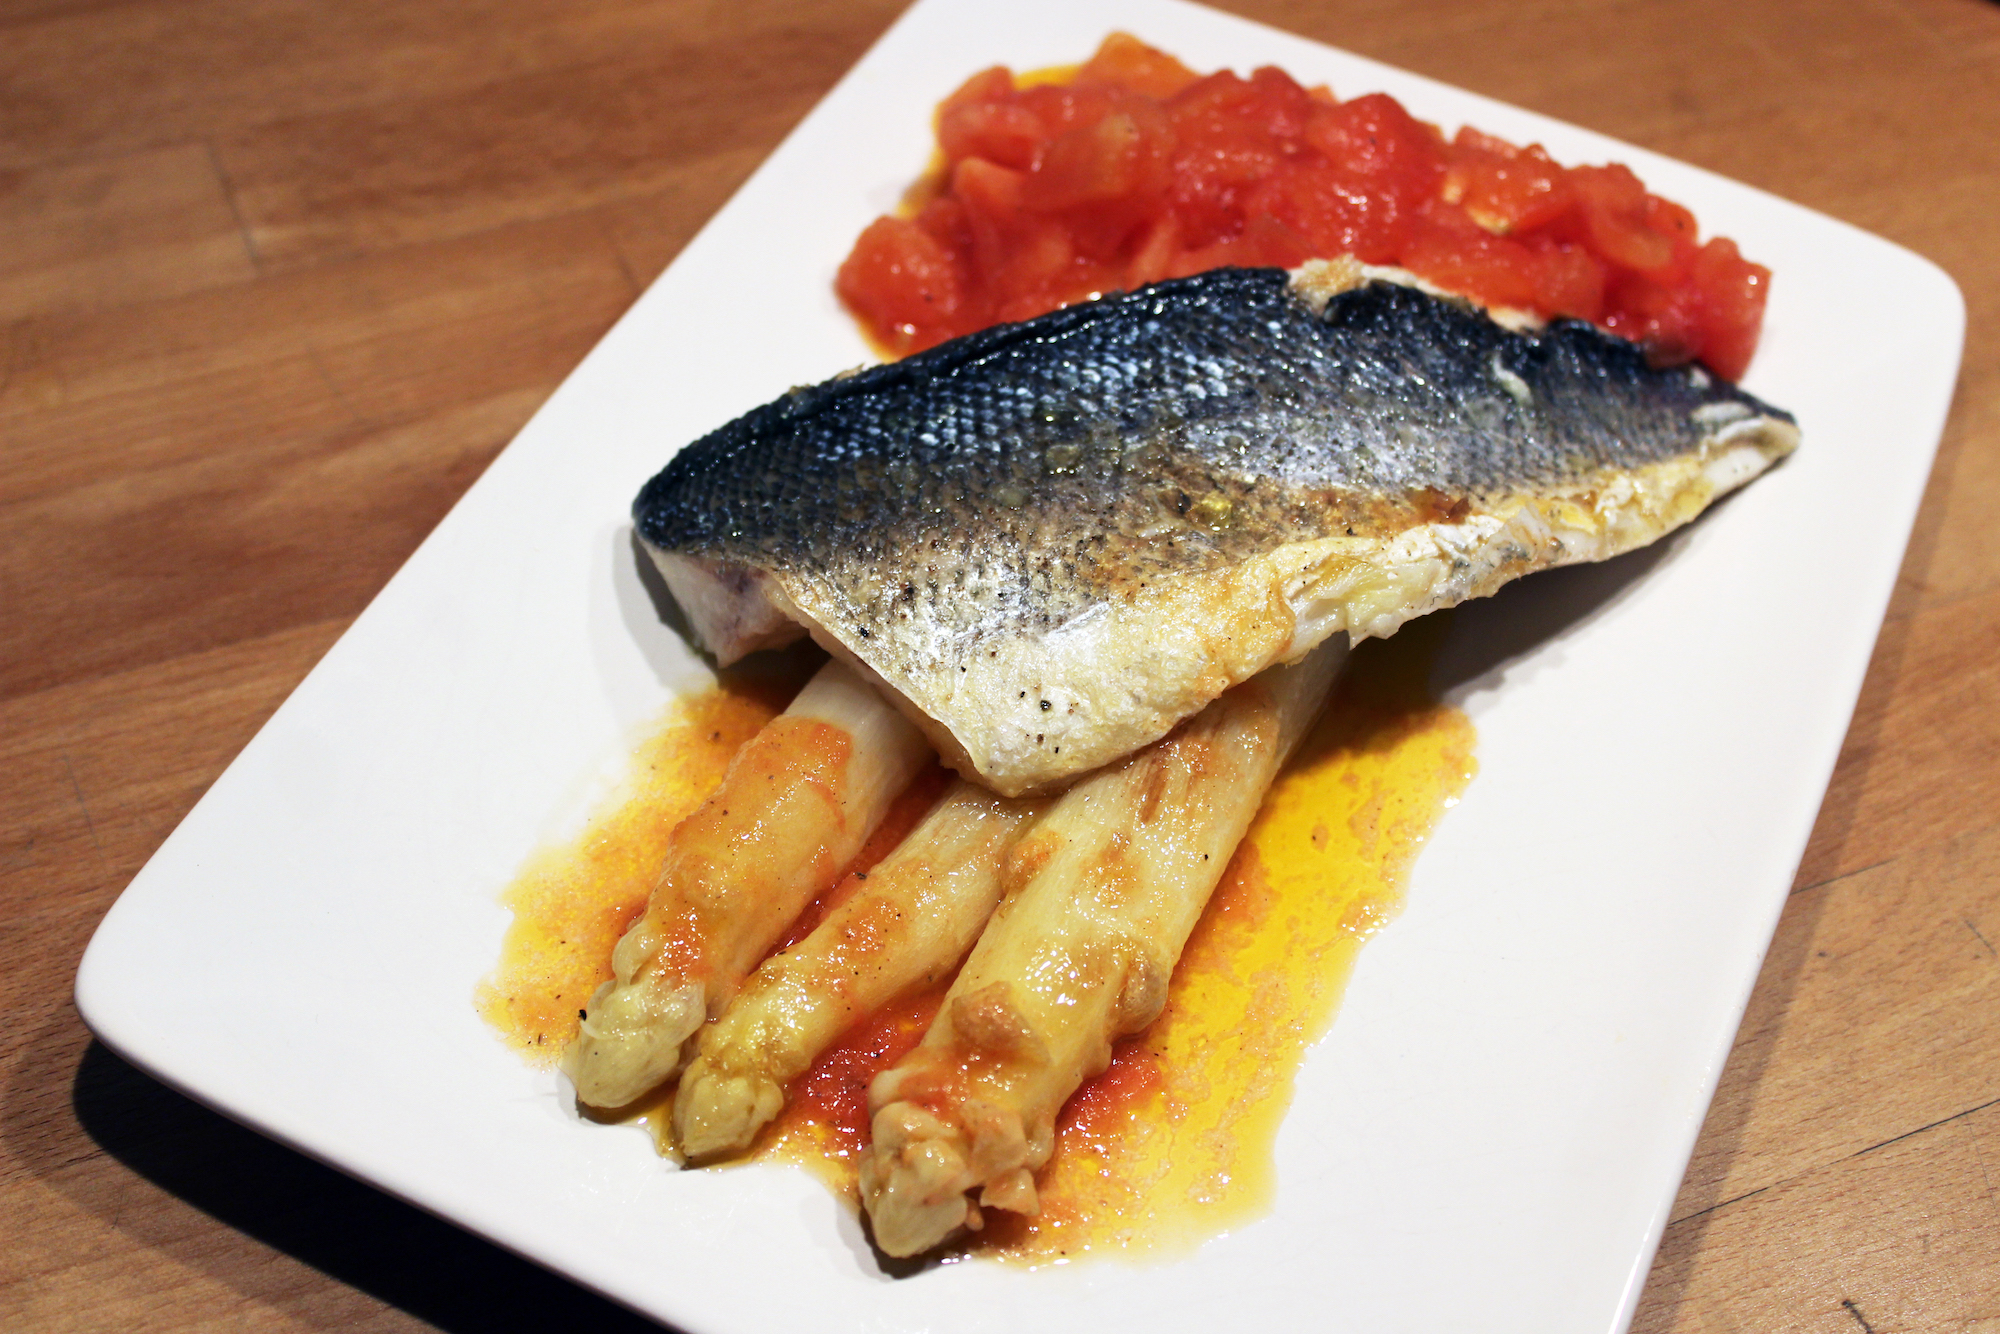 Op vel gebakken zeebaars met asperges en tomaat (Pascale Naessens)